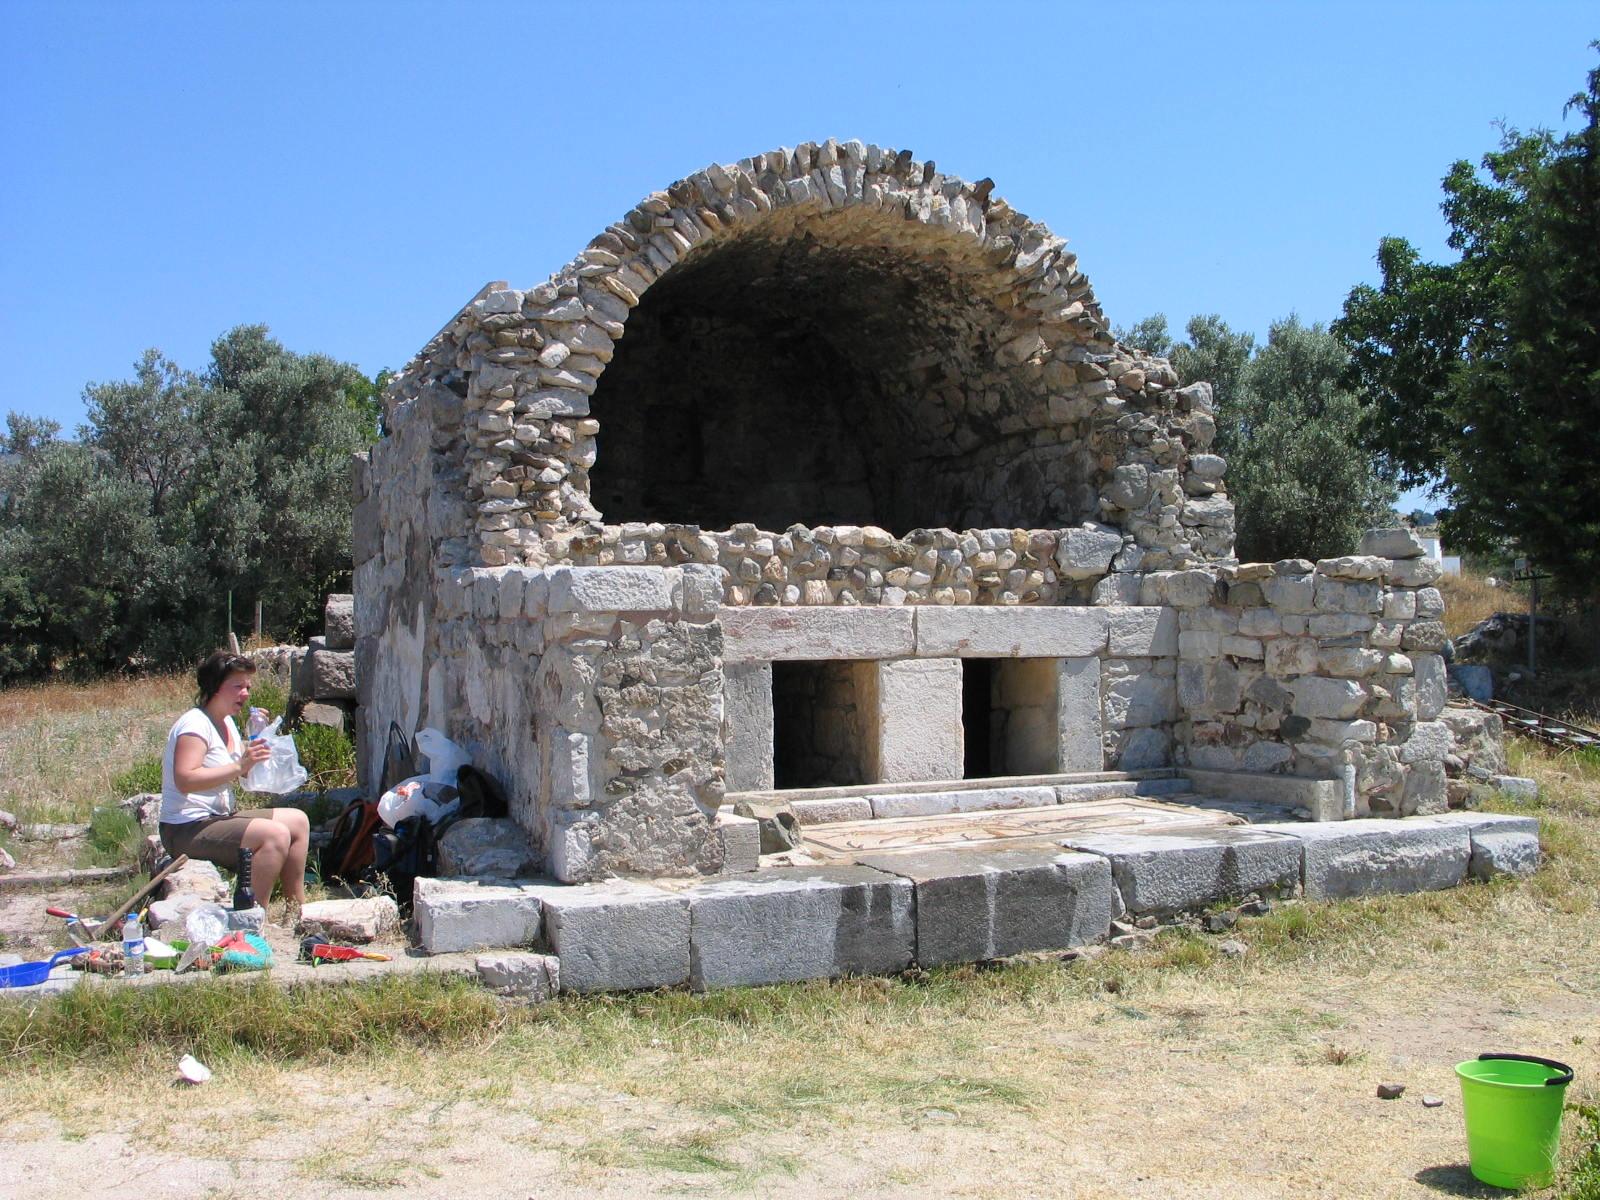 Fig. 4. Tomb 2 (B. Poulsen)